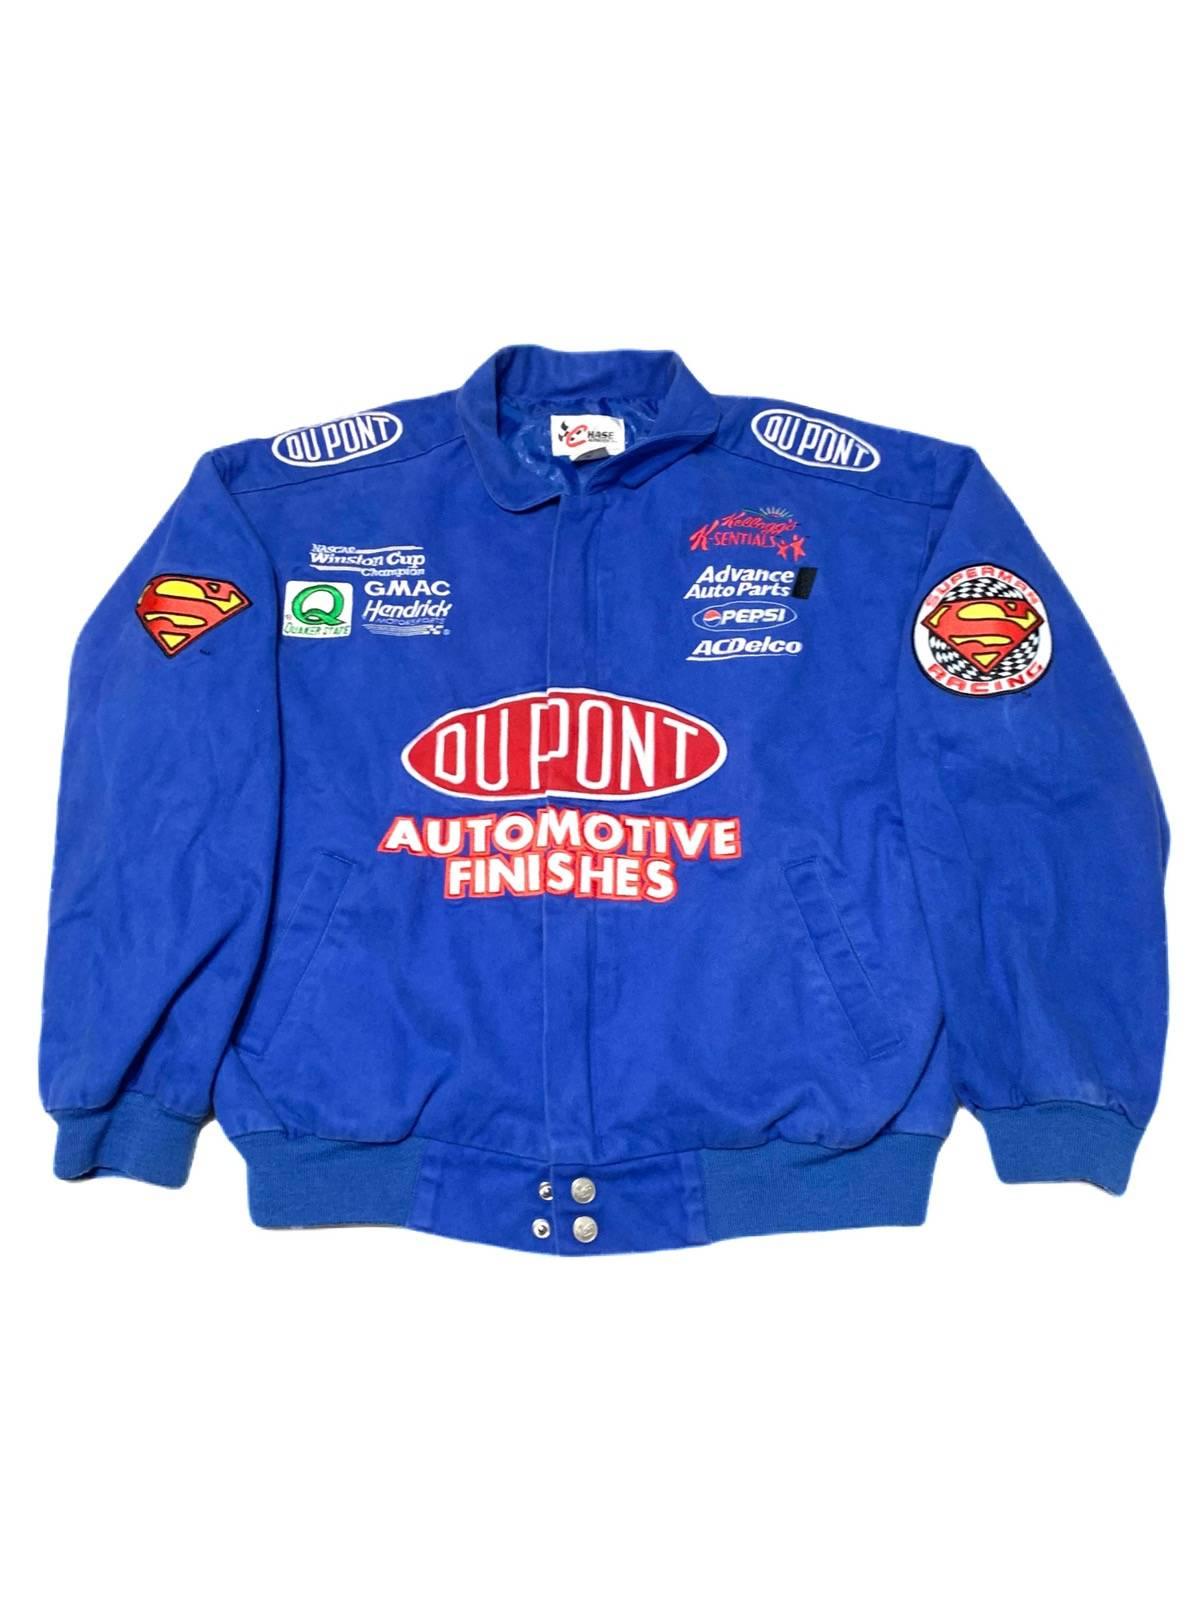 Vintage Jeff Gordon Nascar Racing Jacket Grailed